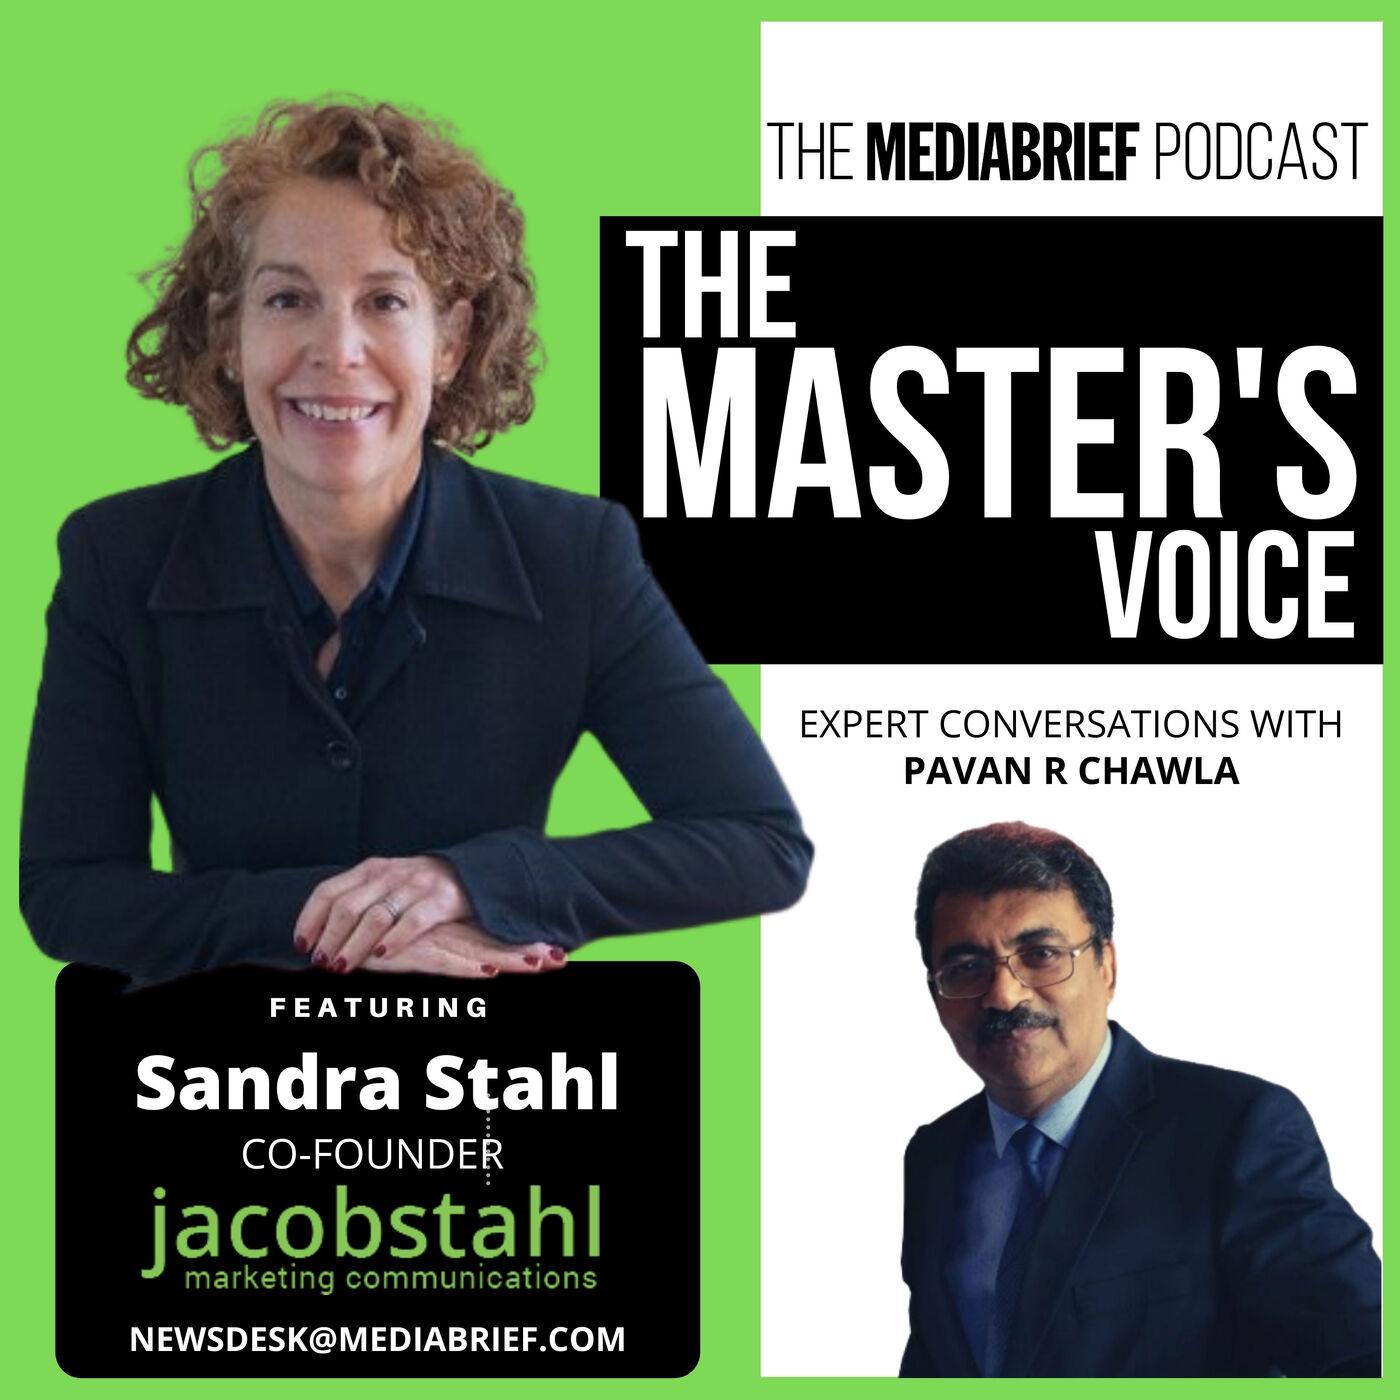 PODCAST | Sandra Stahl of jacobstahl New York shares insights on communication